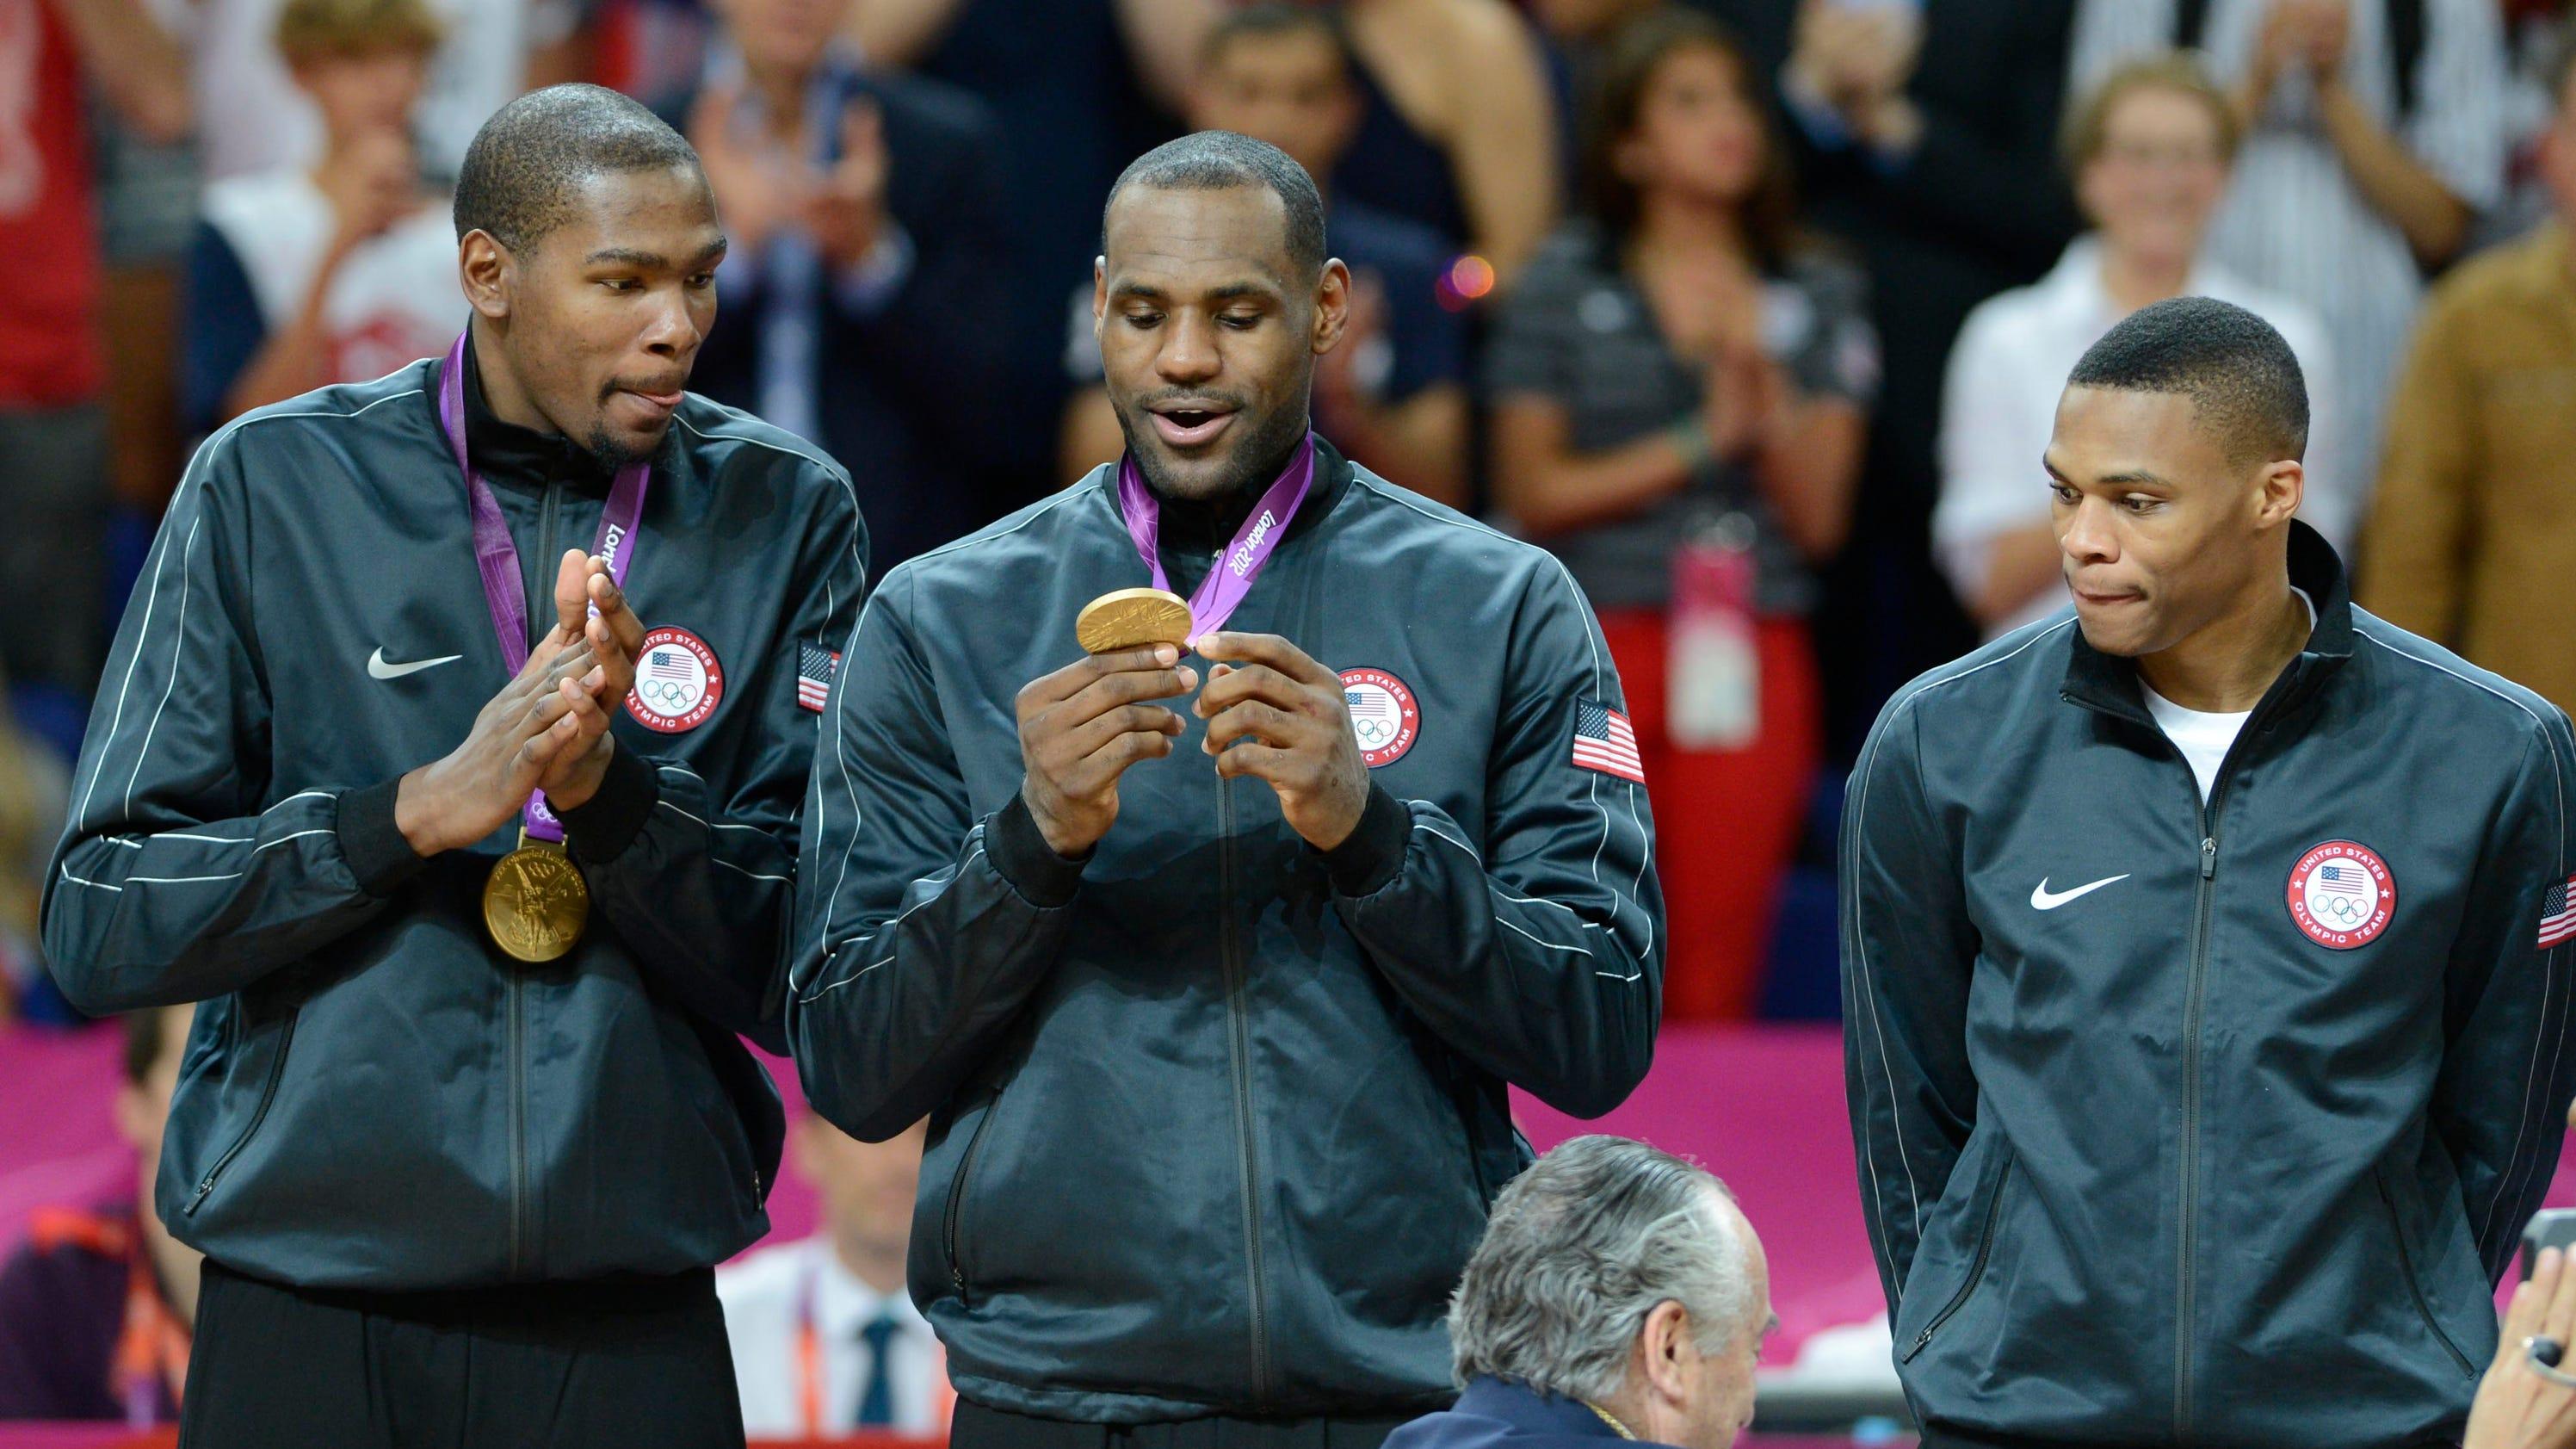 _basketball-men_s_gold_medal_game-usa_50853545